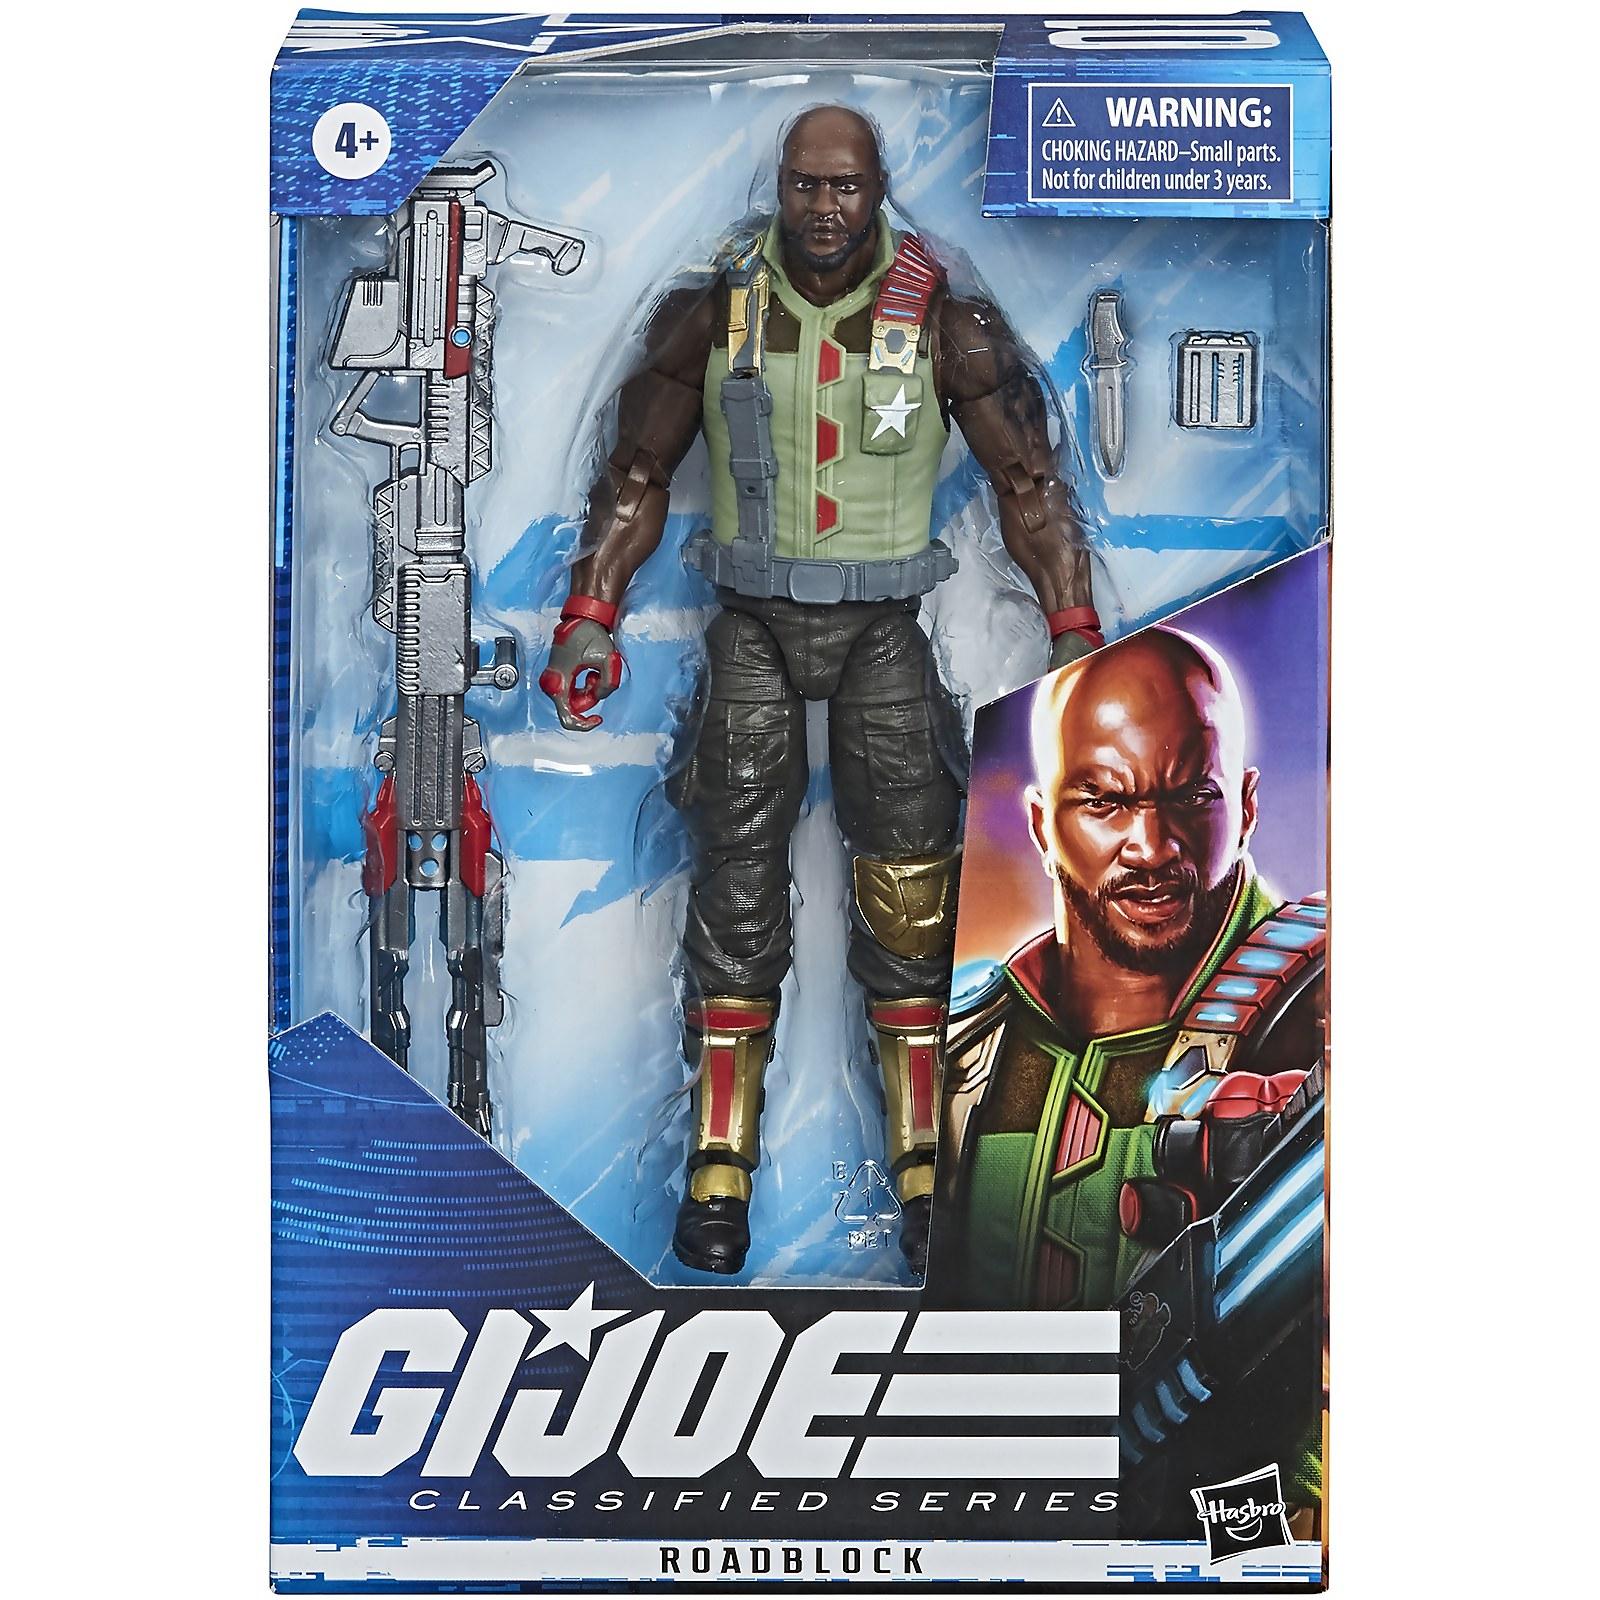 Image of Hasbro G.I. Joe Classified Series Roadblock 6-Inch Scale Action Figure 01